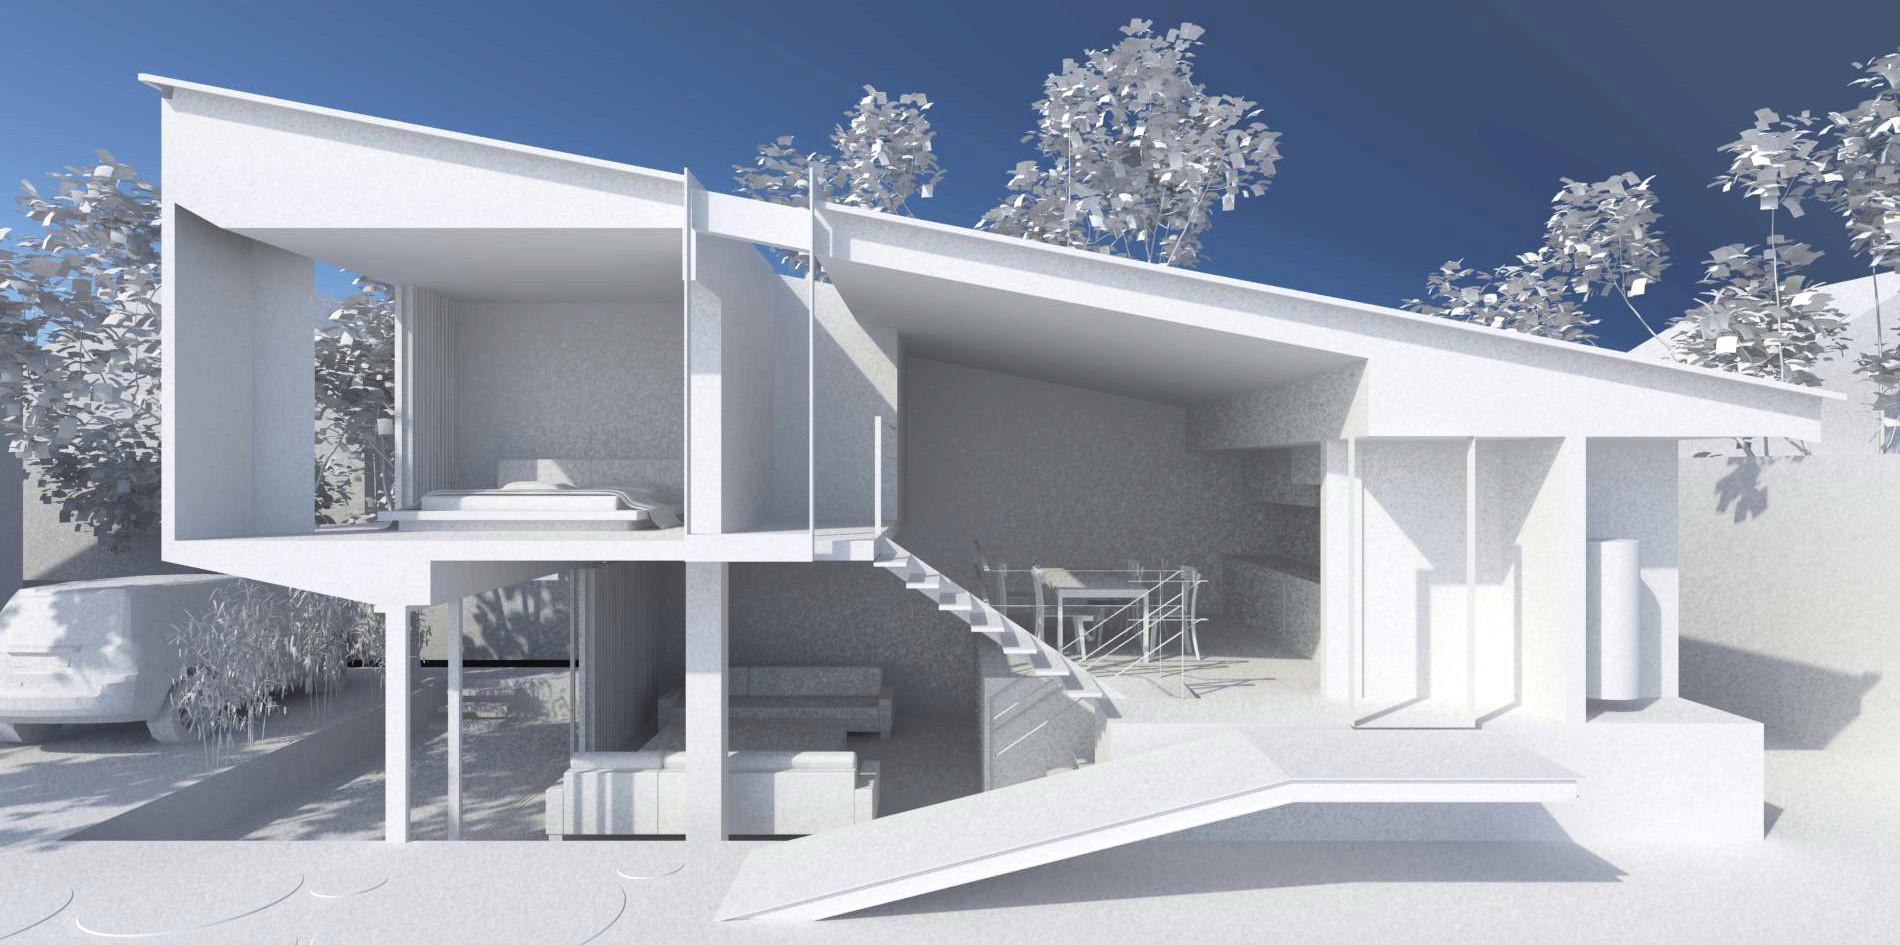 1.5-Storey house